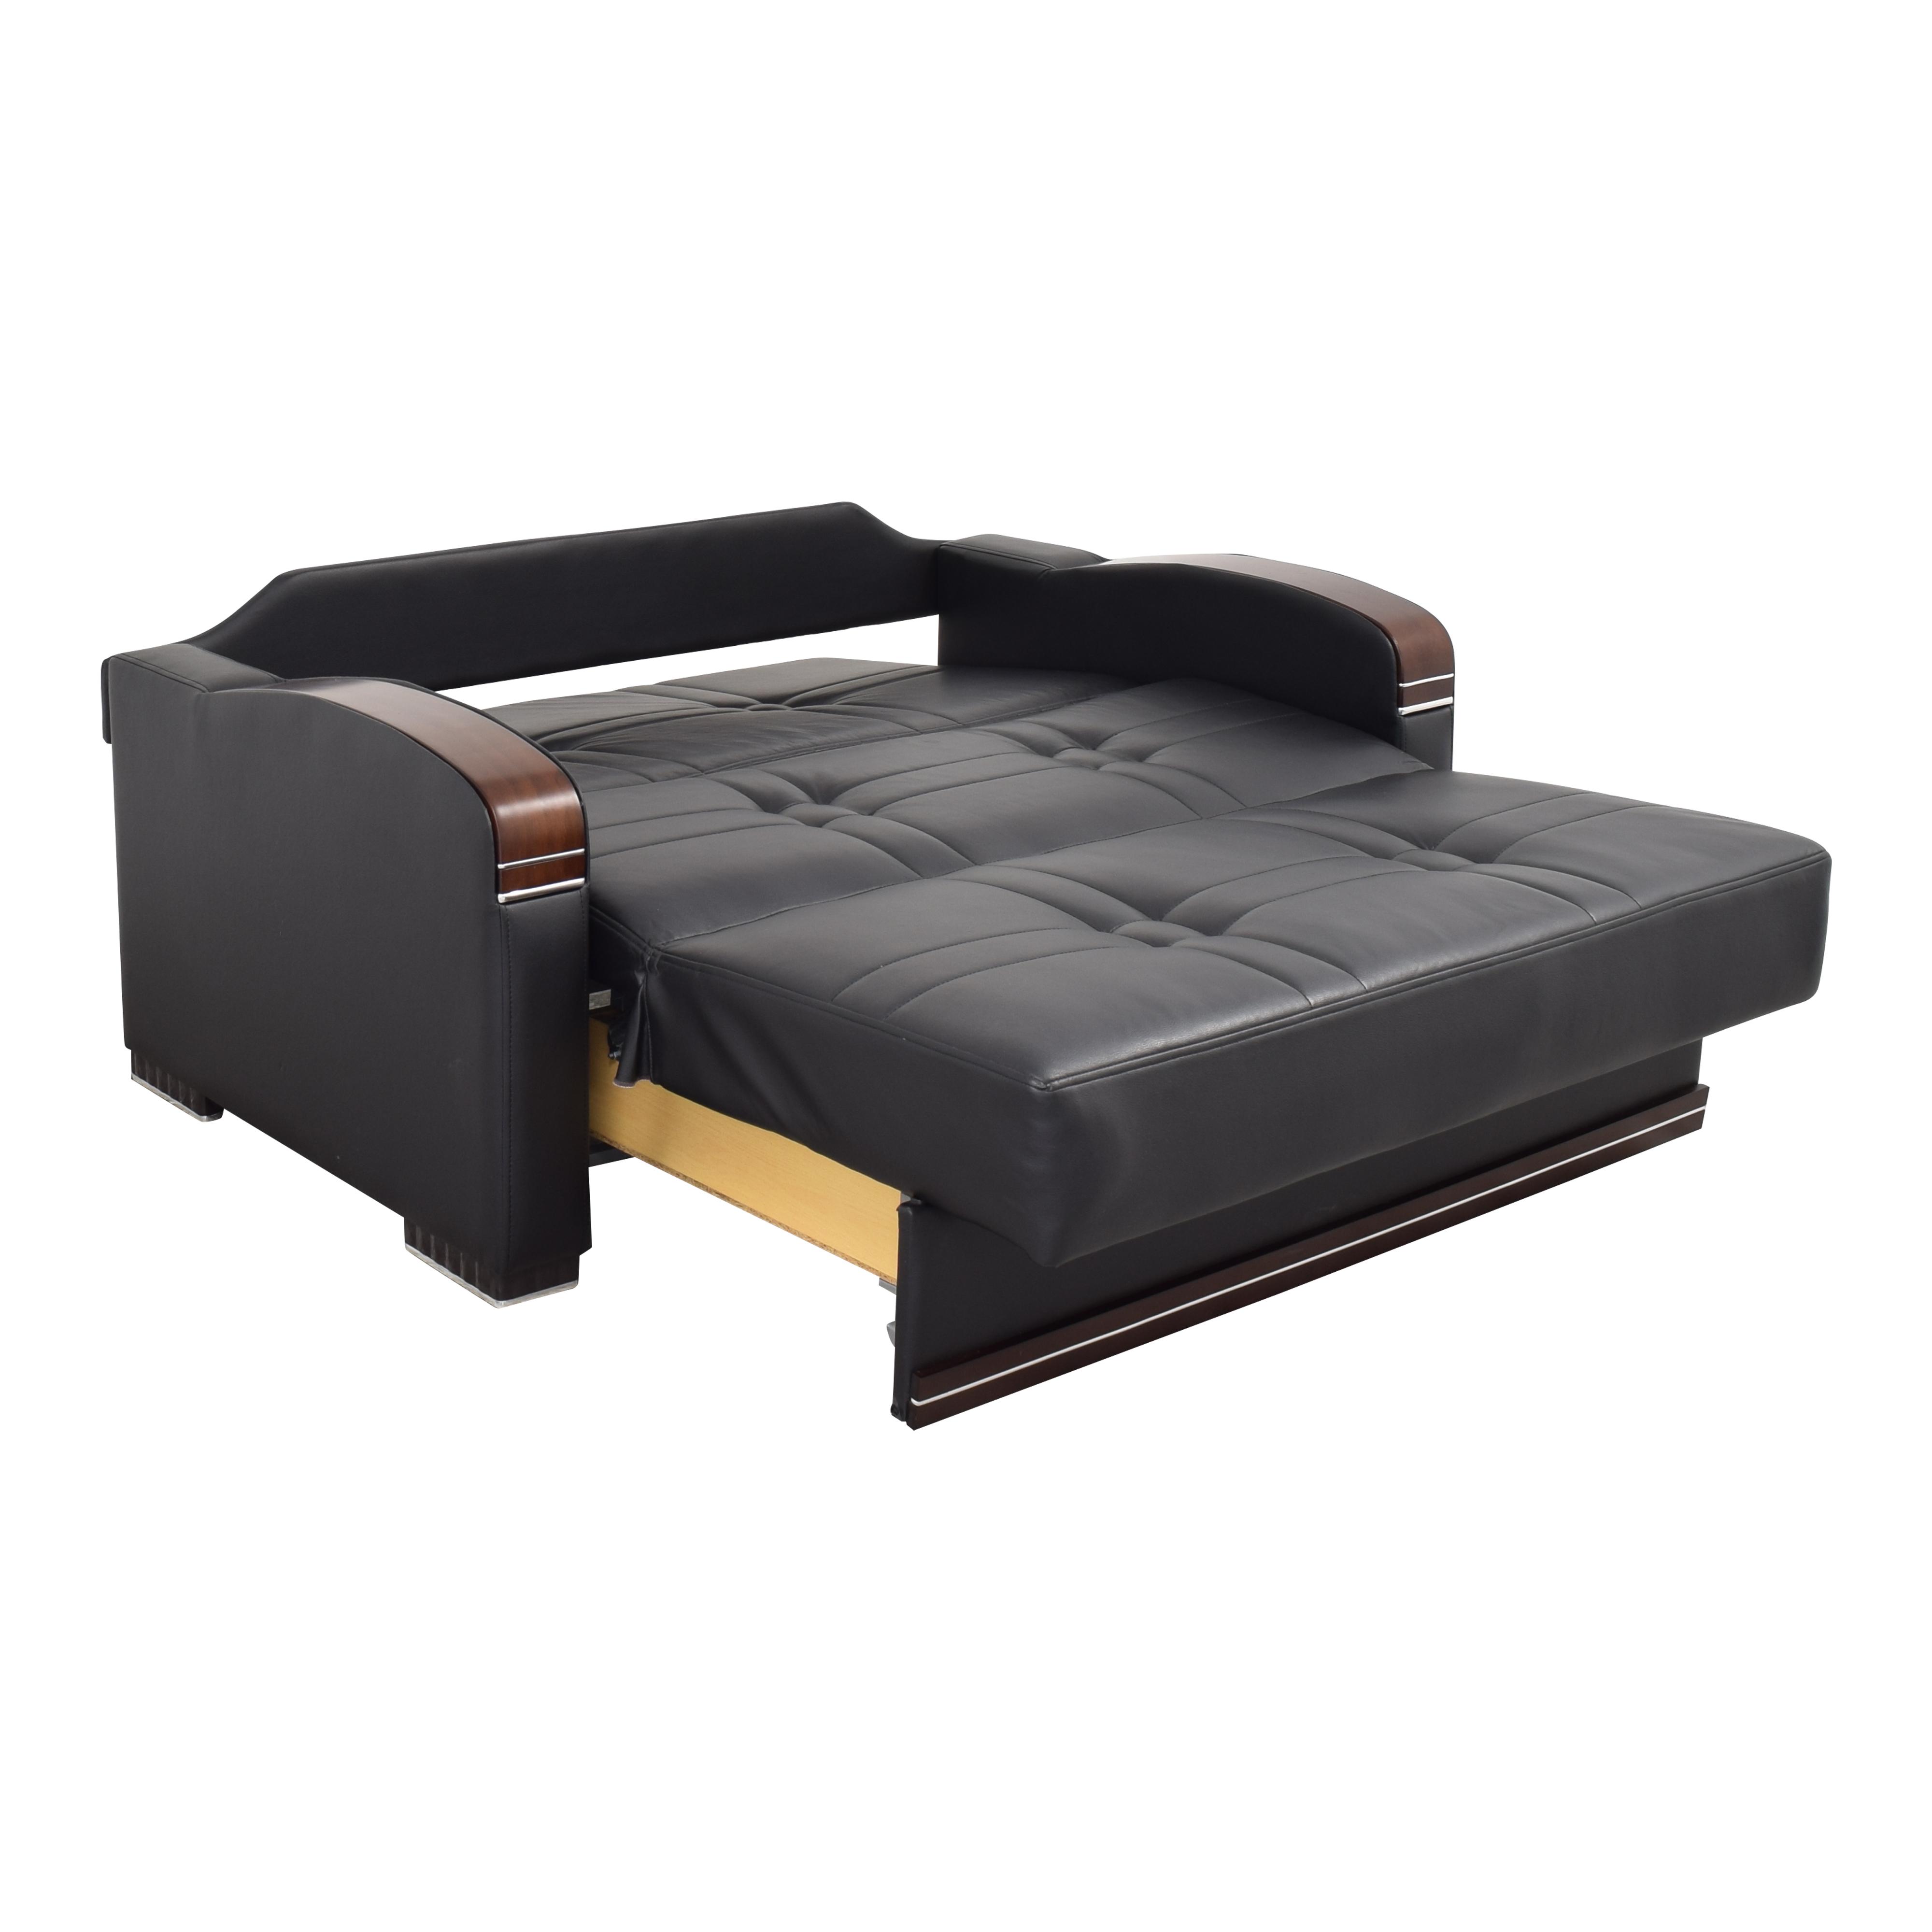 Sofaitalia Sofaitalia Black Faux Leather Full Sleeper Sofa nj